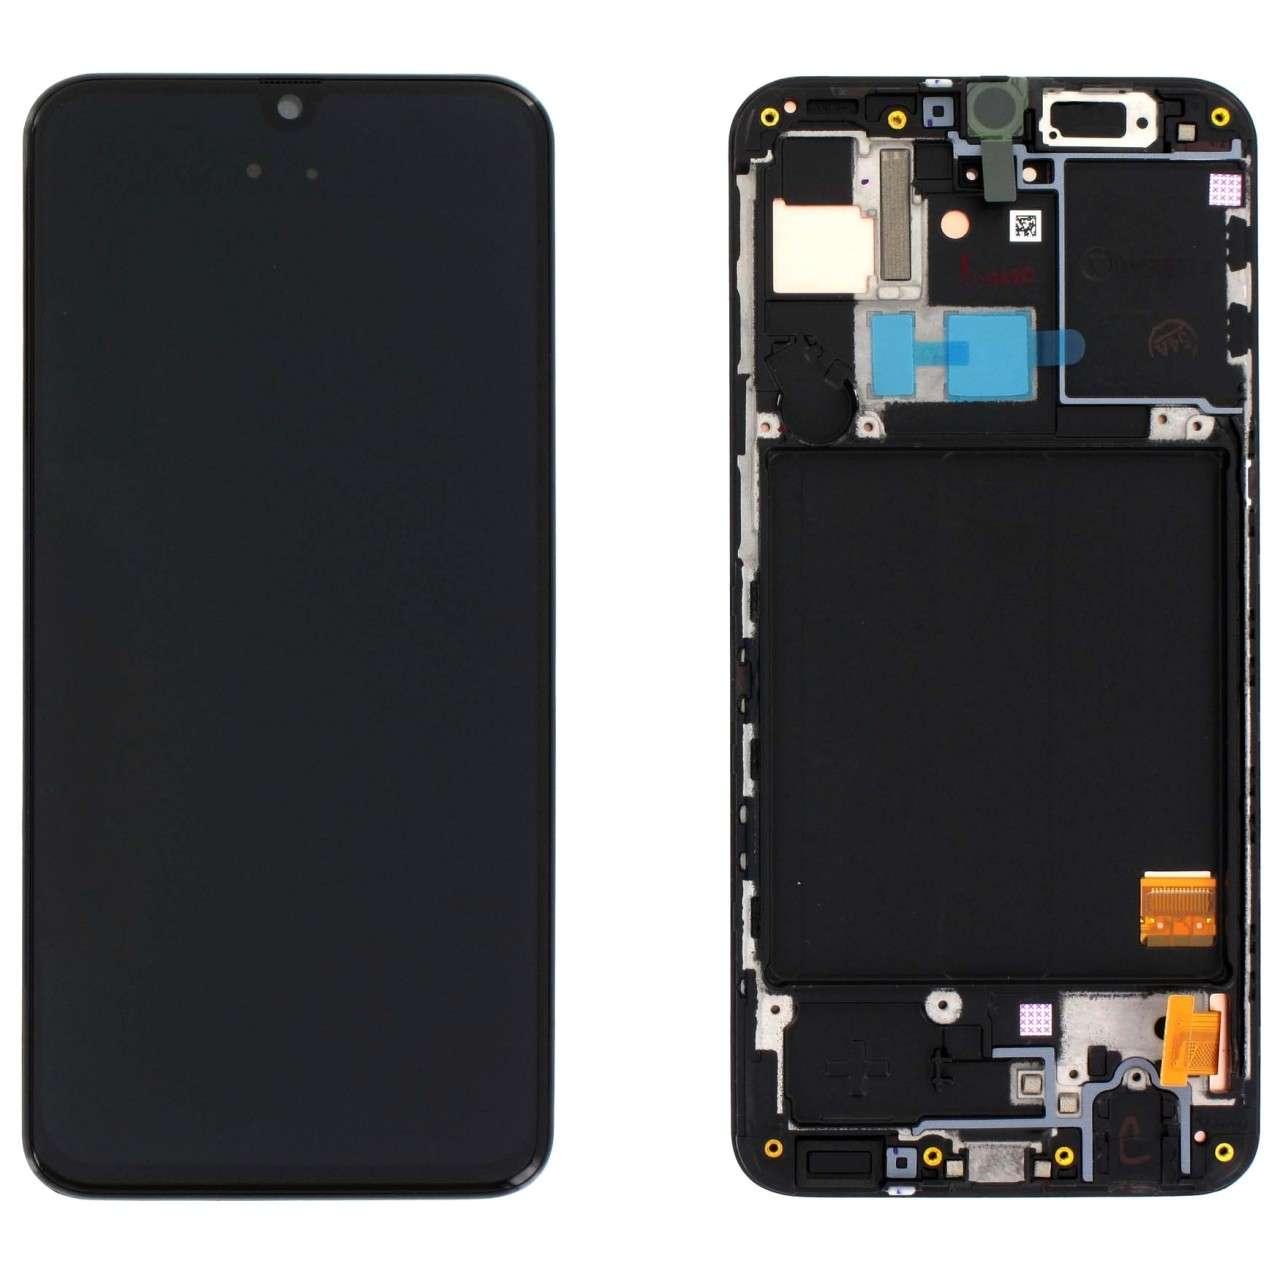 Display Samsung Galaxy A31 2020 A315 Display Original Service Pack Black Negru imagine powerlaptop.ro 2021